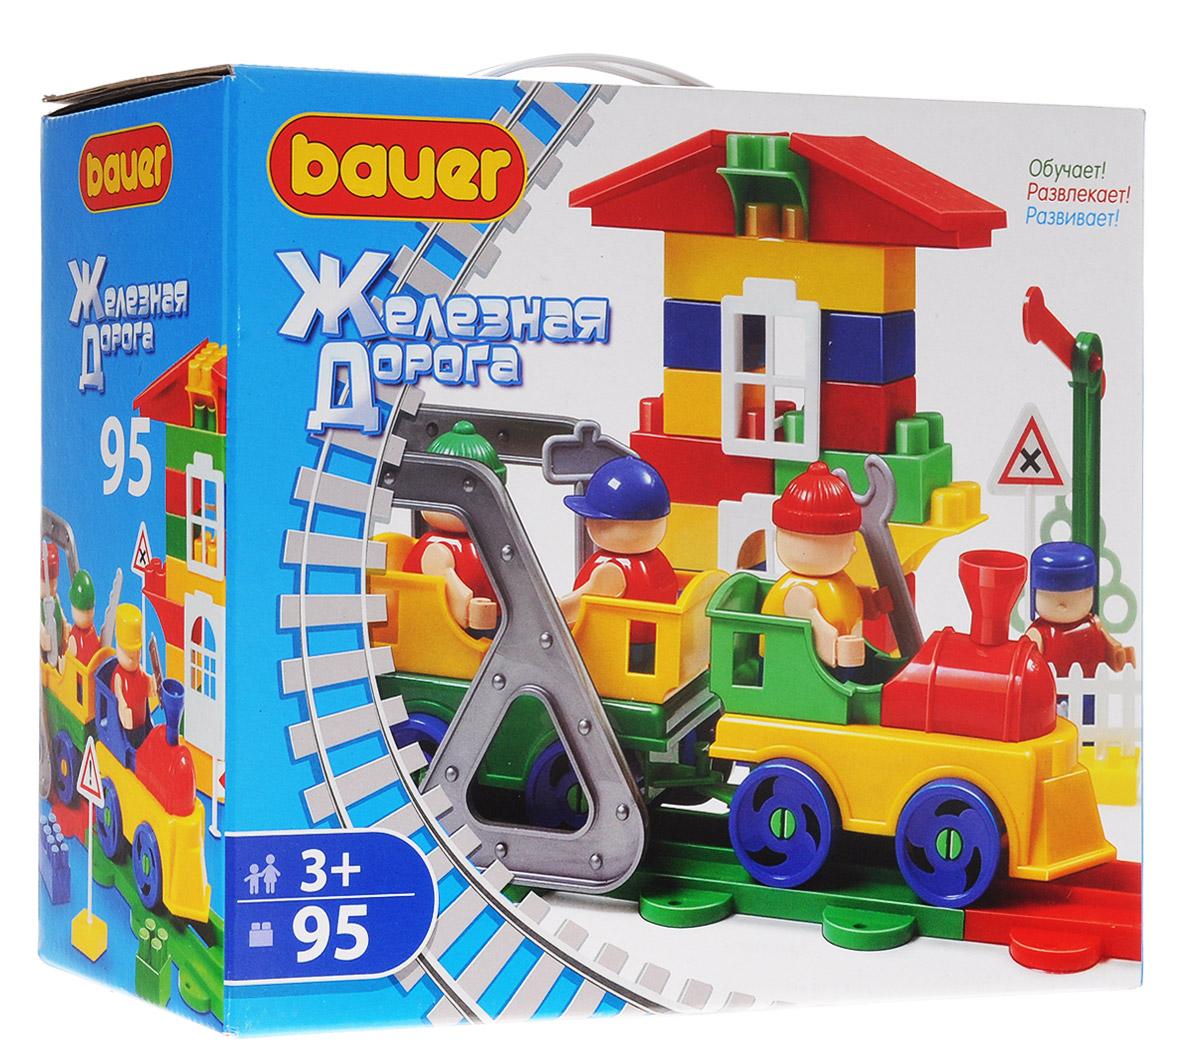 Bauer Конструктор Железная дорога 253 конструктор bauer железная дорога 254